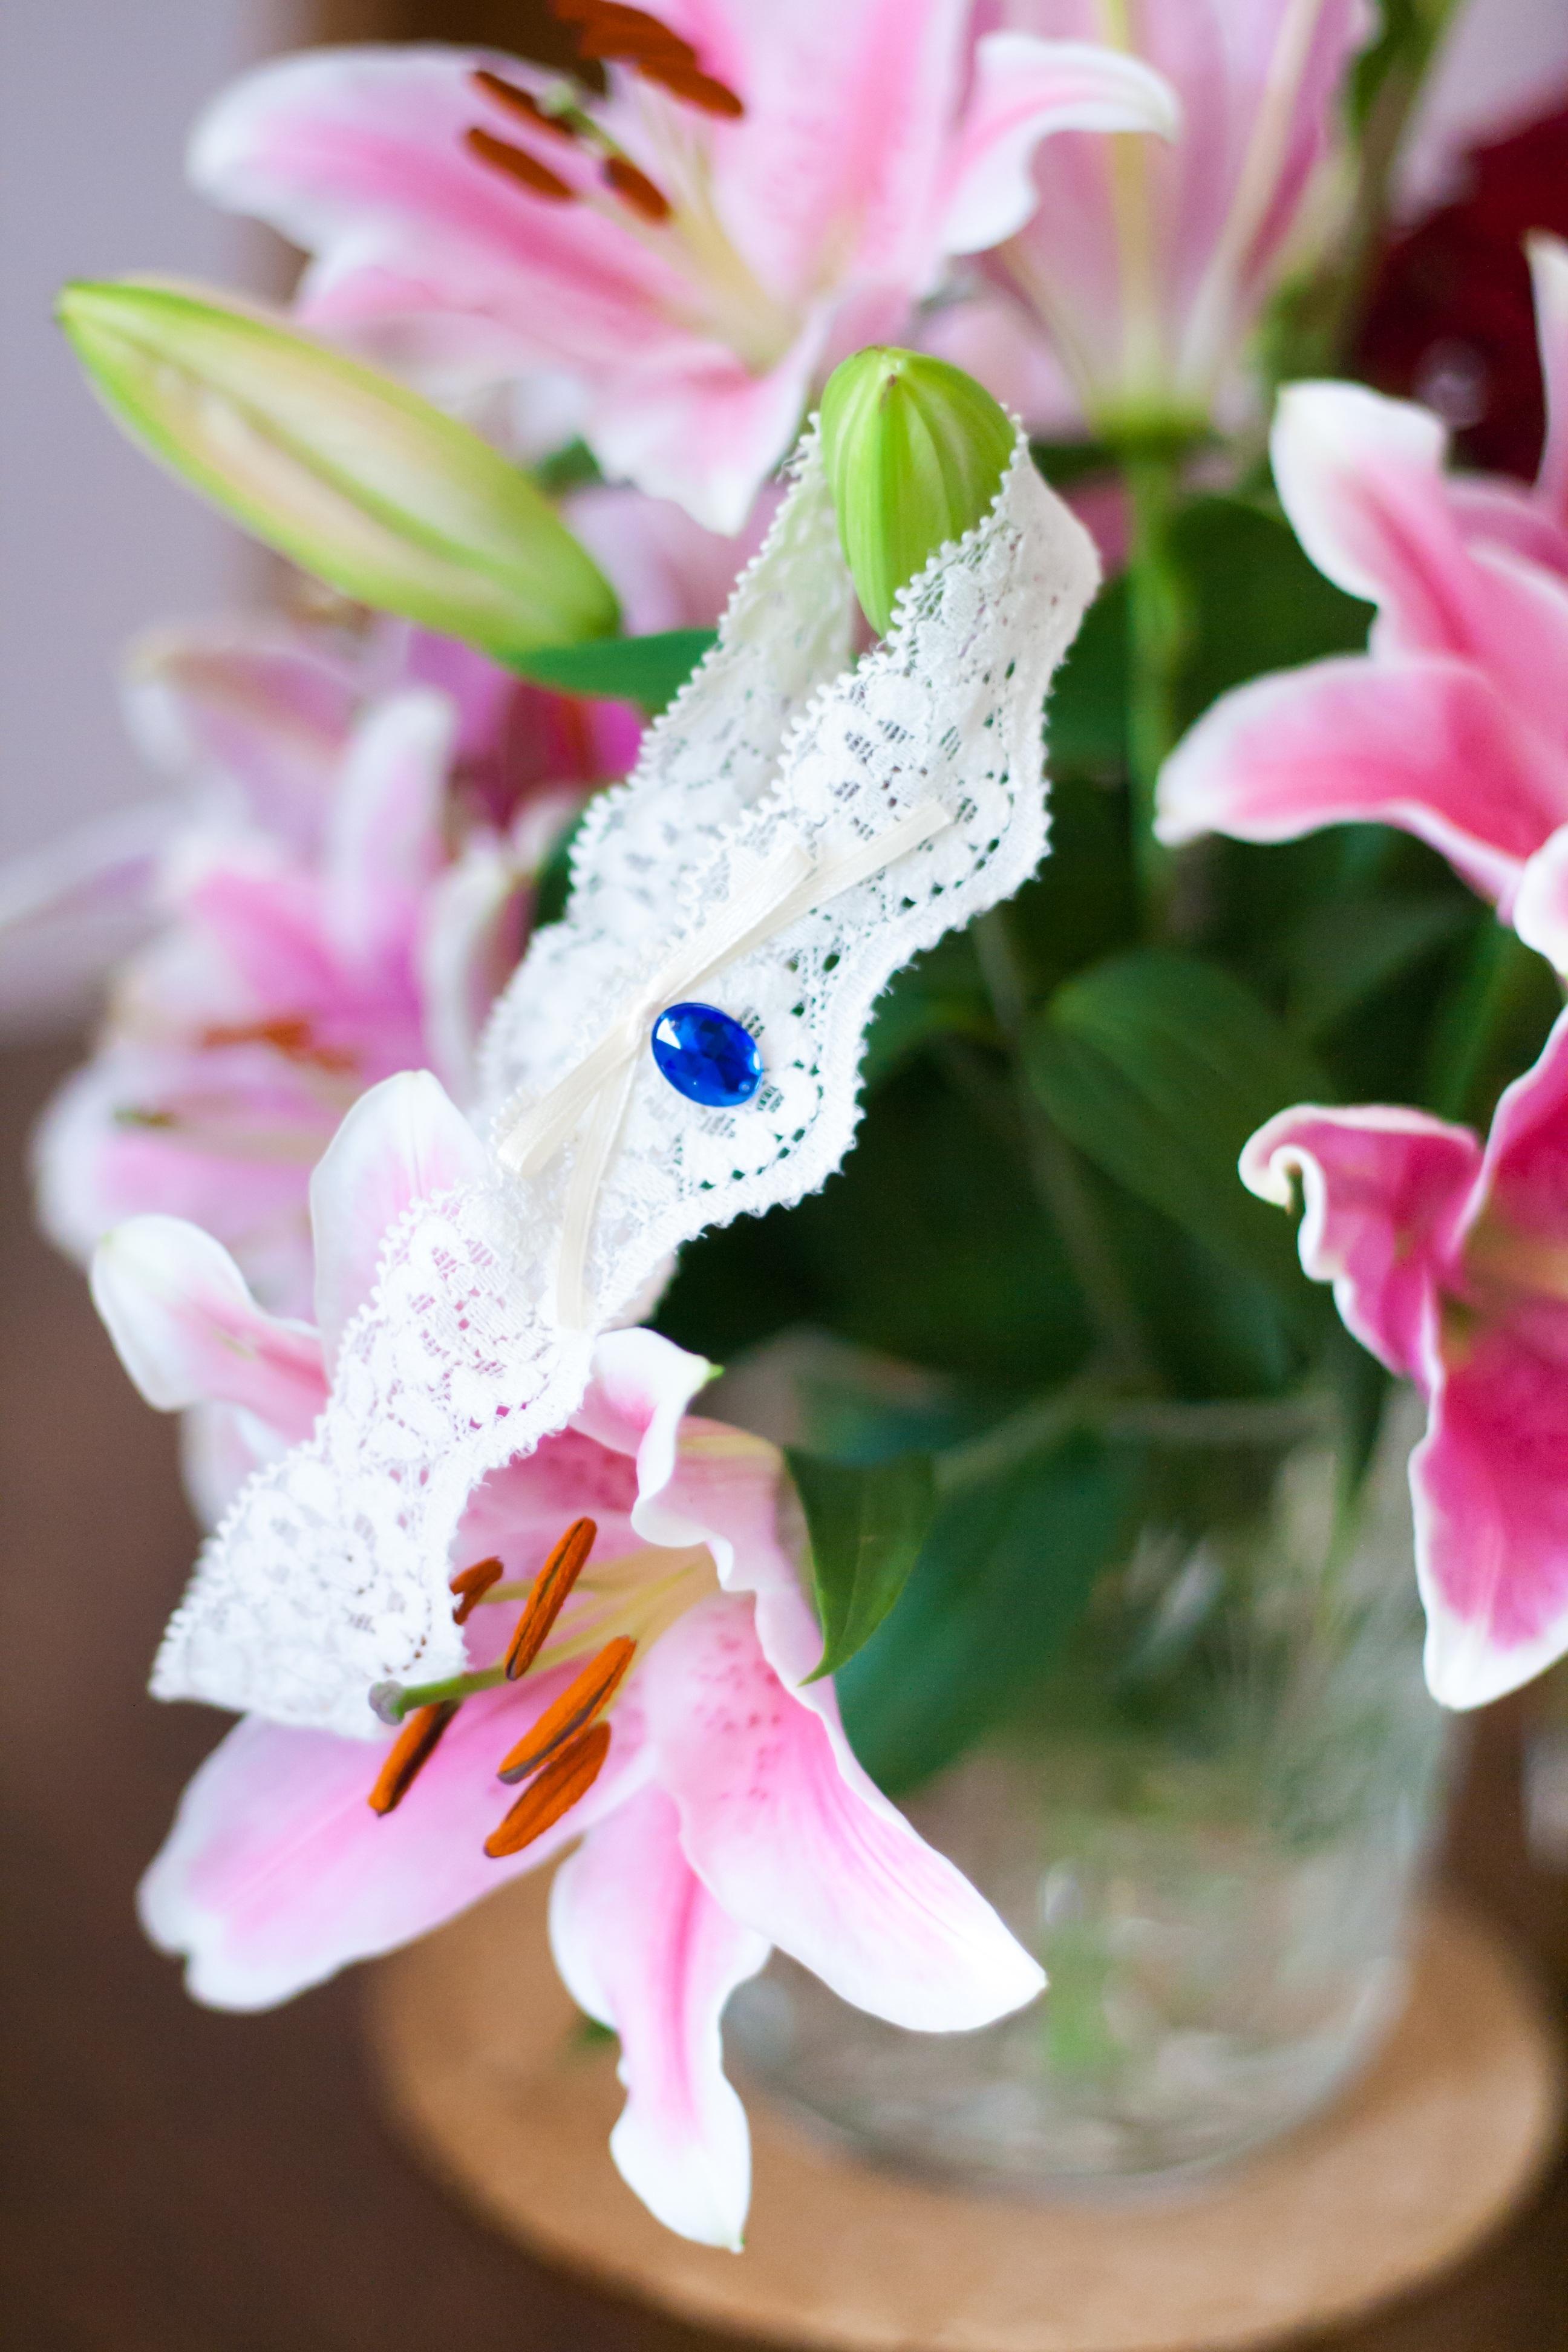 Free Images : blossom, white, petal, spring, pink, wedding, flora ...